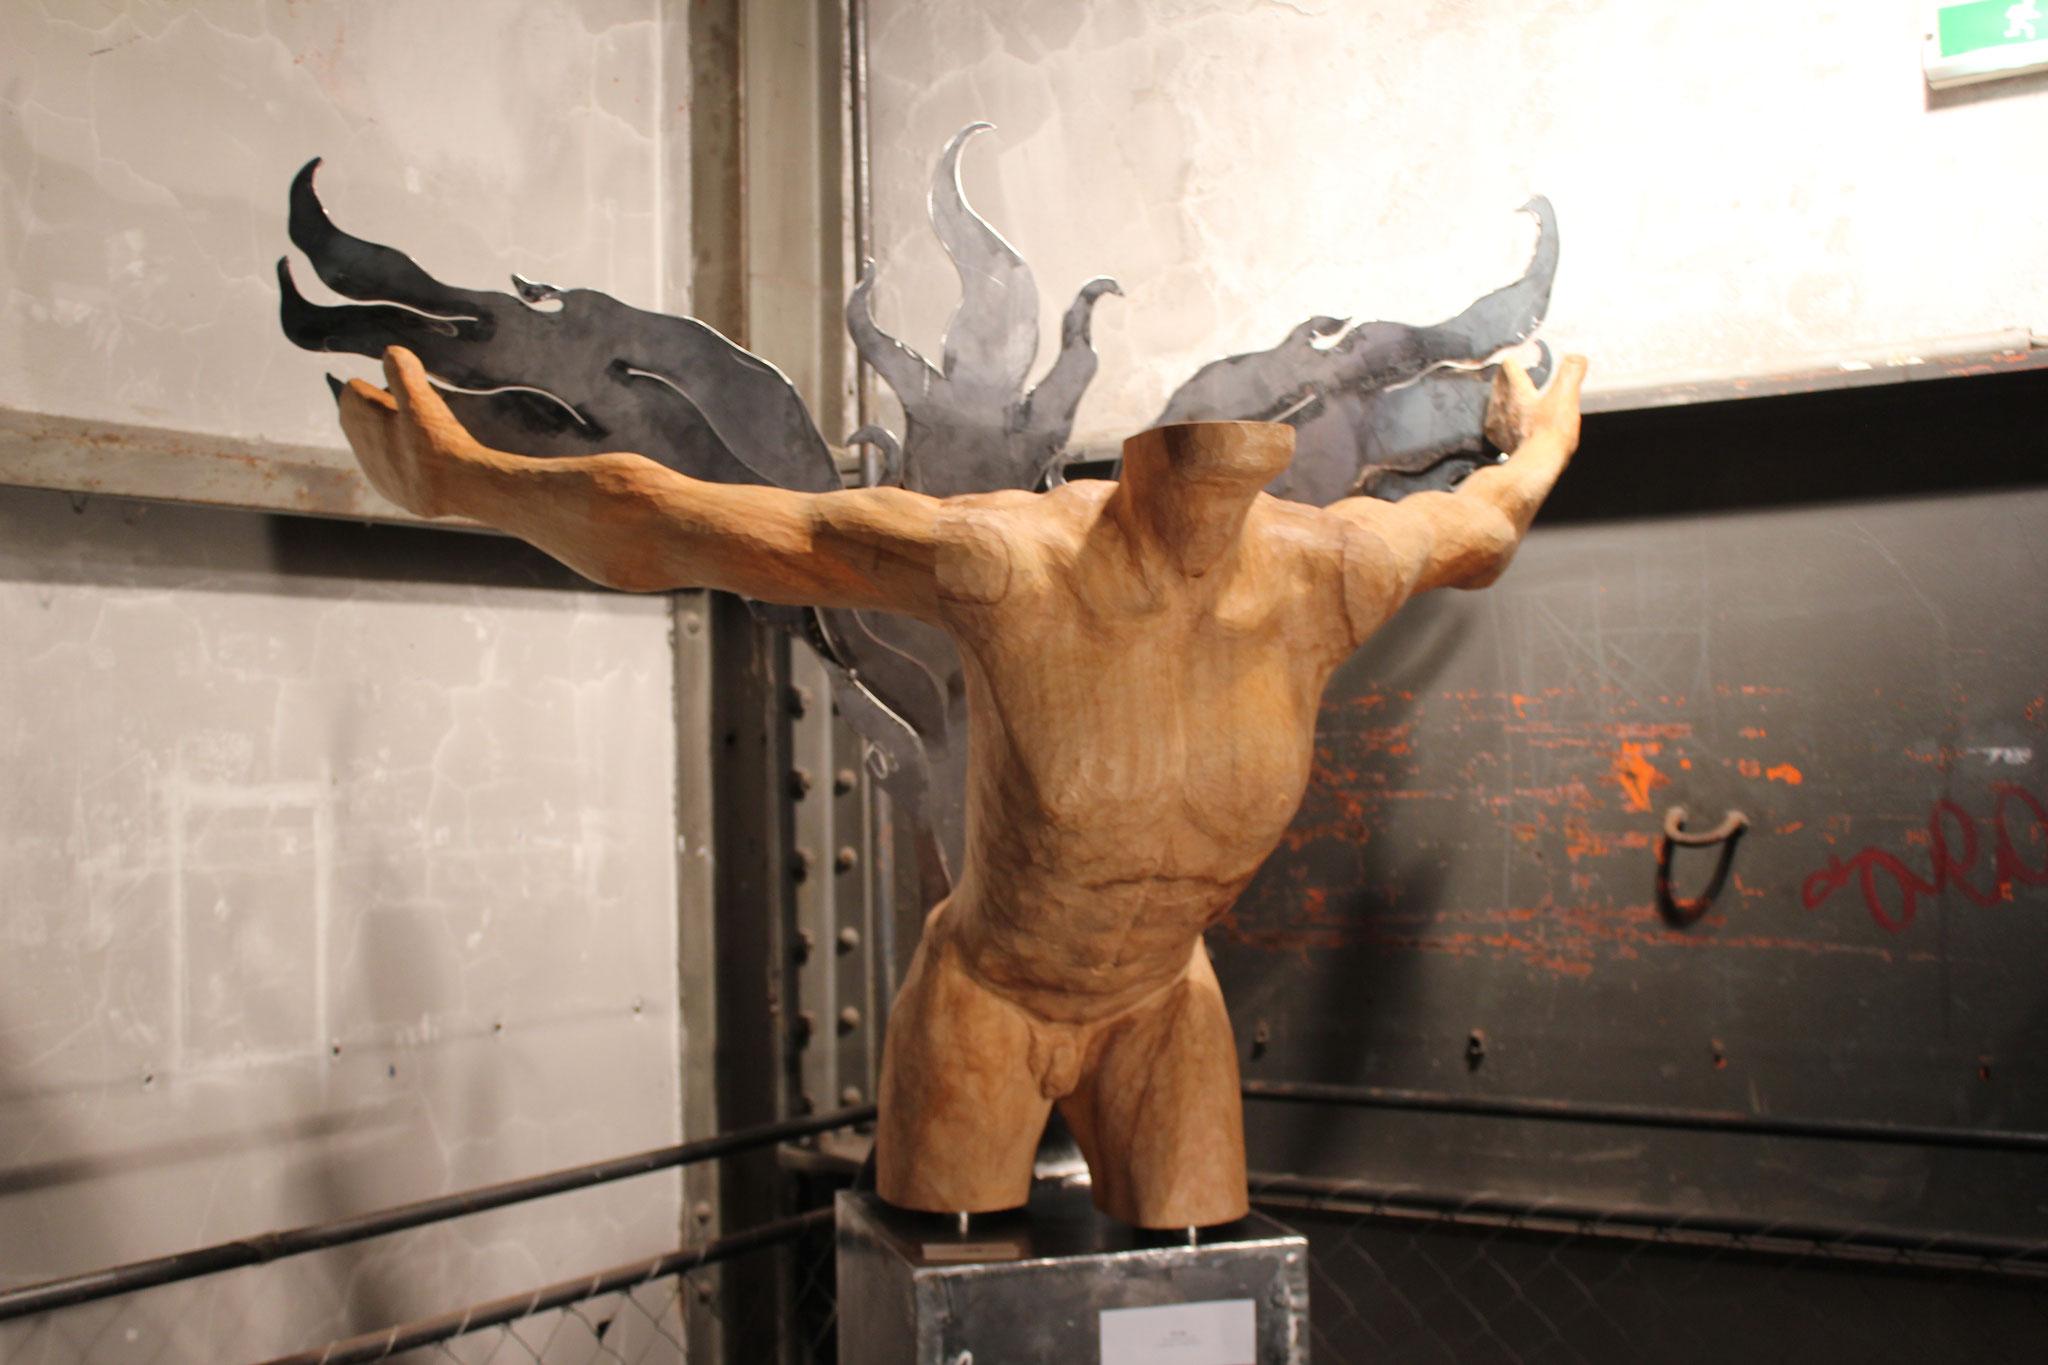 Meisterstück - The Human Phoenix